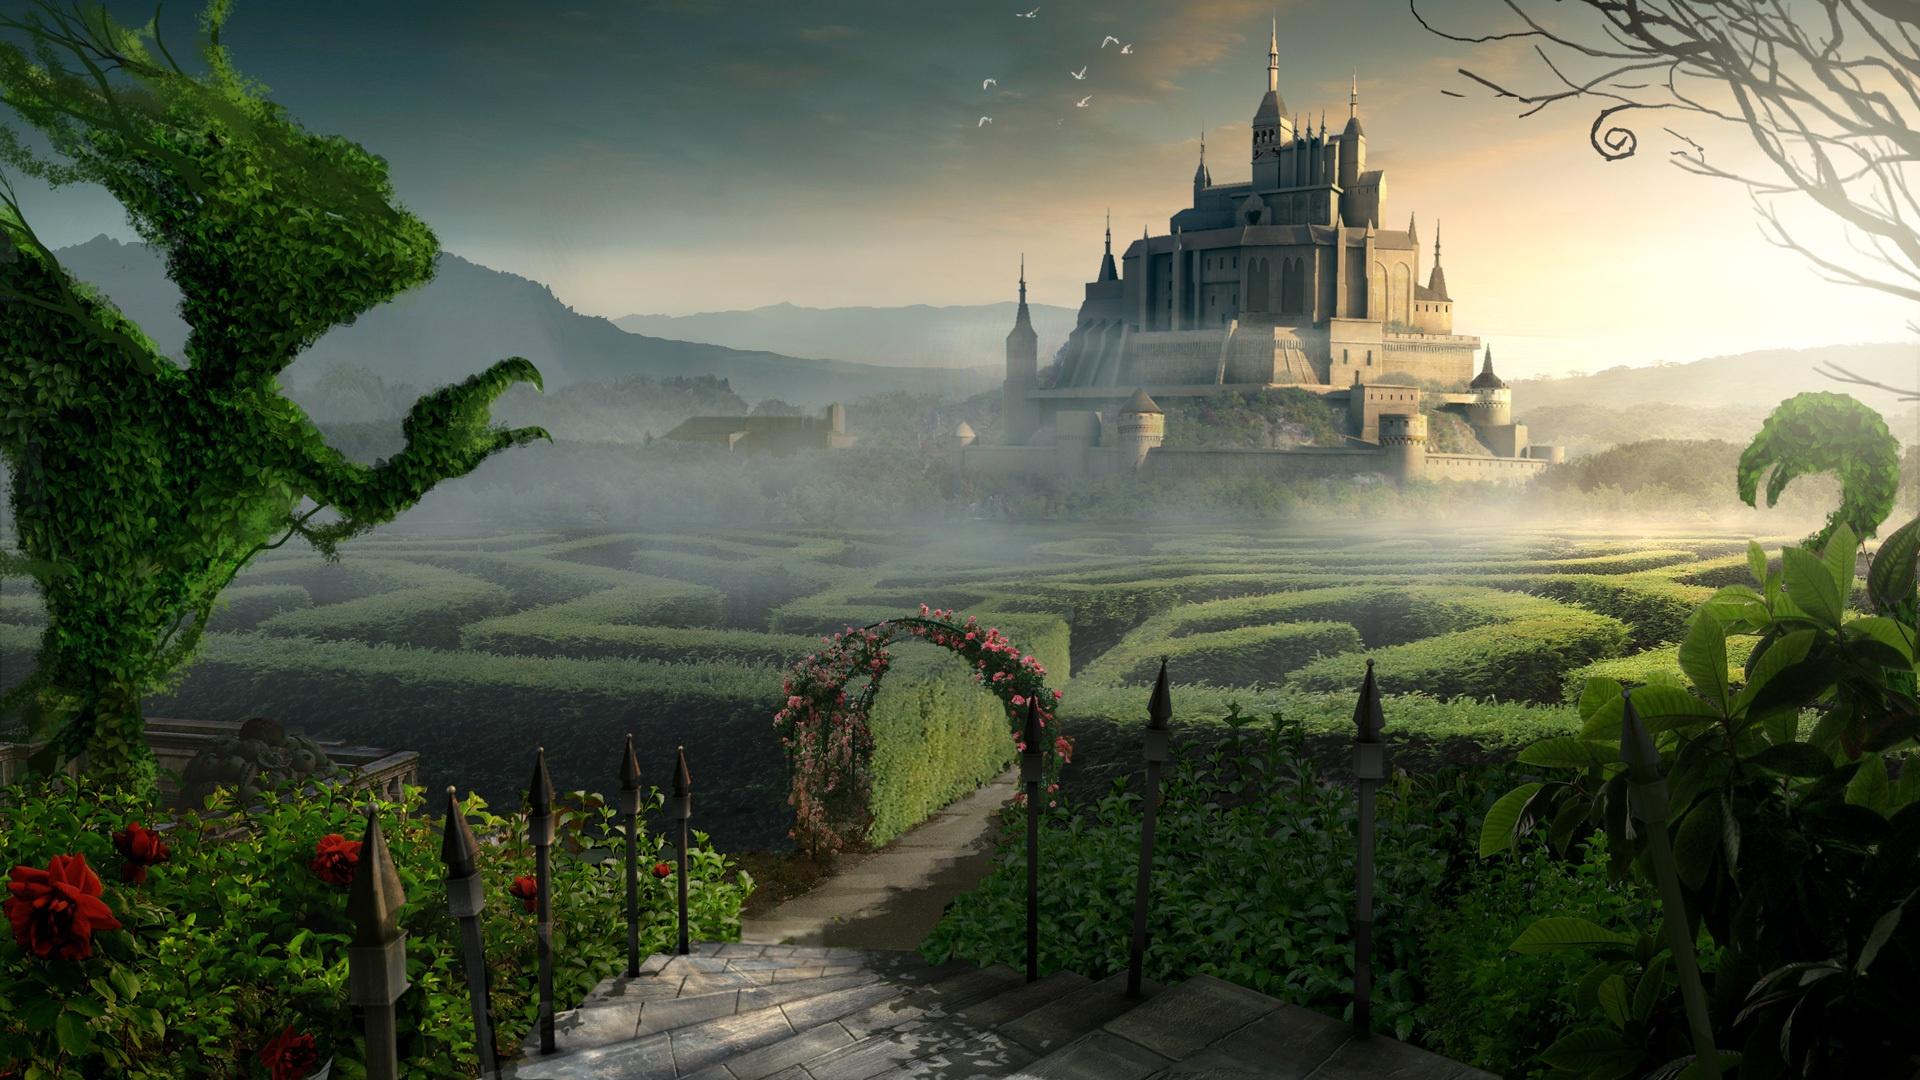 Fantasy Landsсape wallpaper download